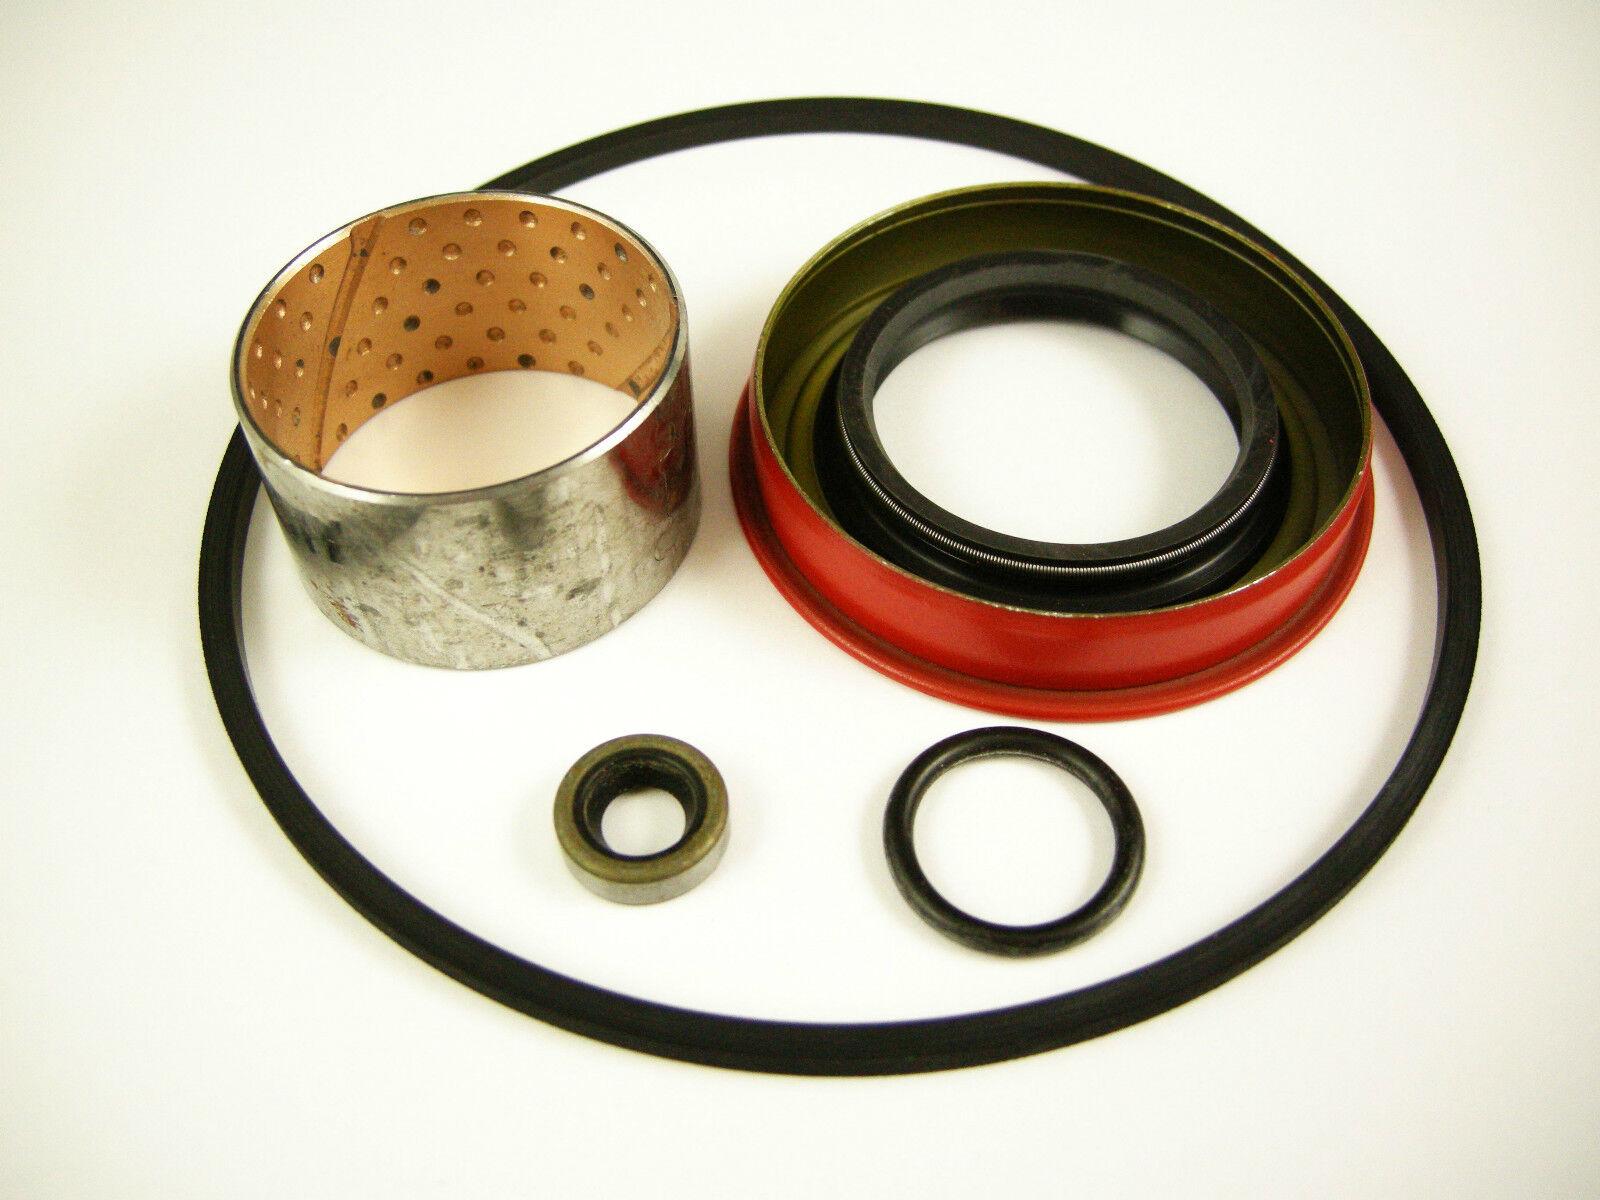 Th350 Rear Extension Tail Housing Leak Stop Seal Kit Turbo 350 Transmission